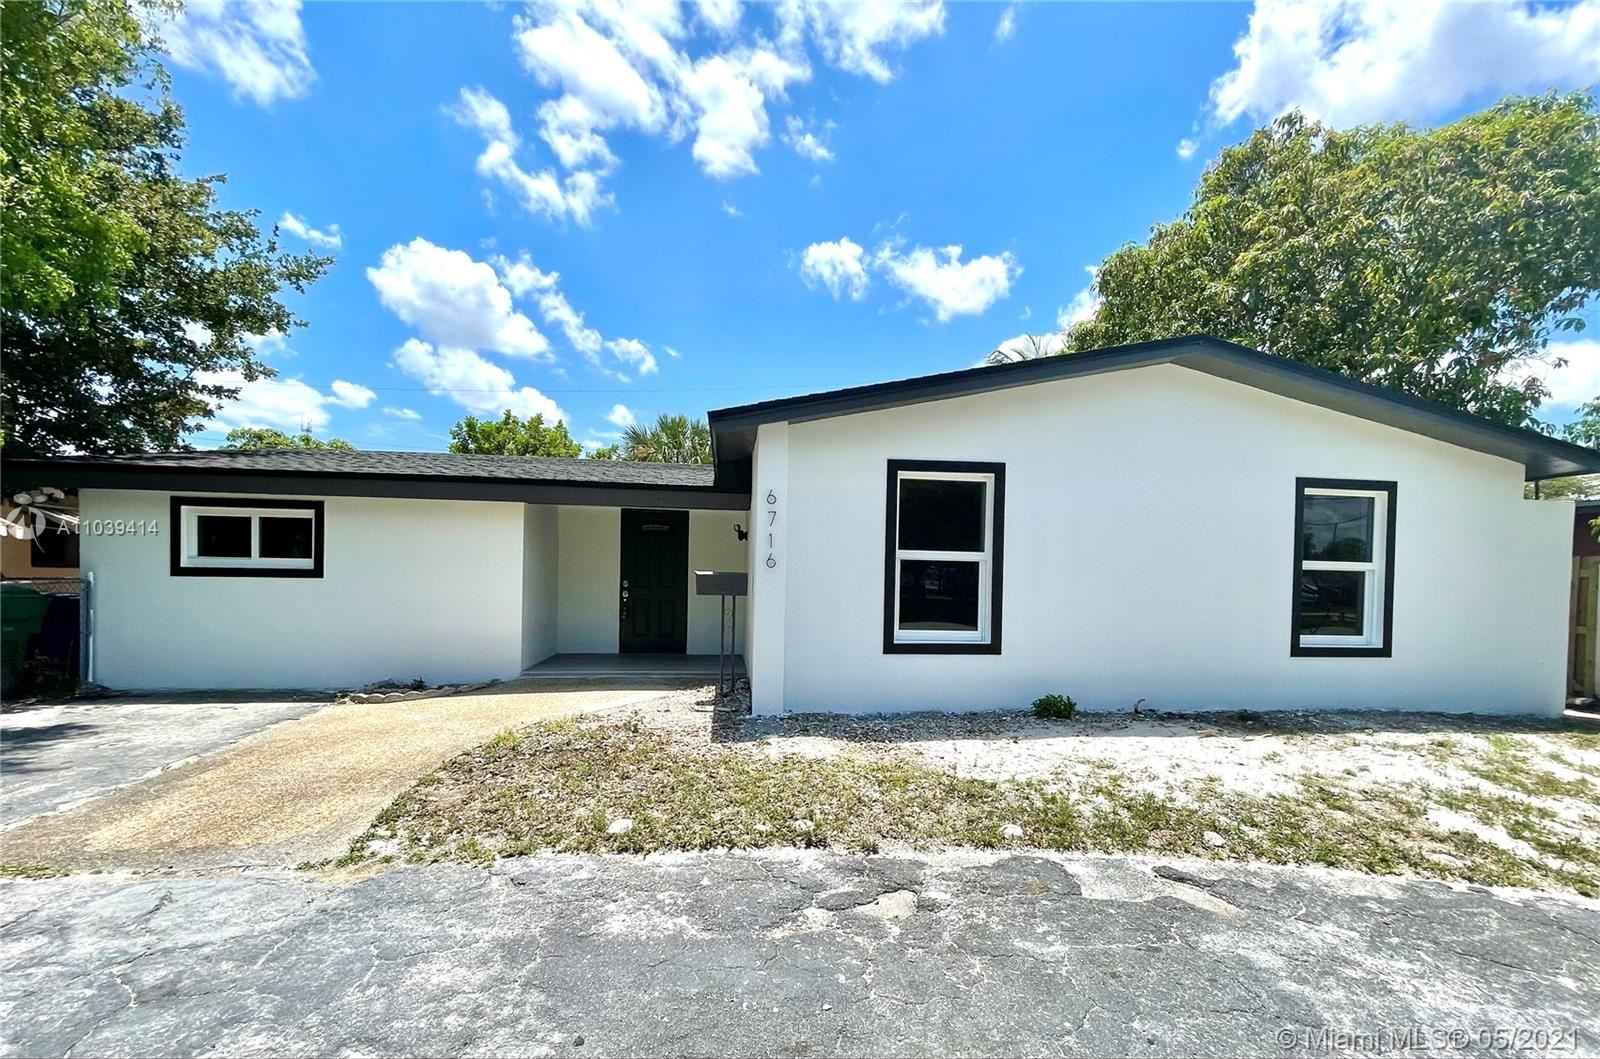 6716 SW 33rd St, Miramar, FL 33023 - #: A11039414